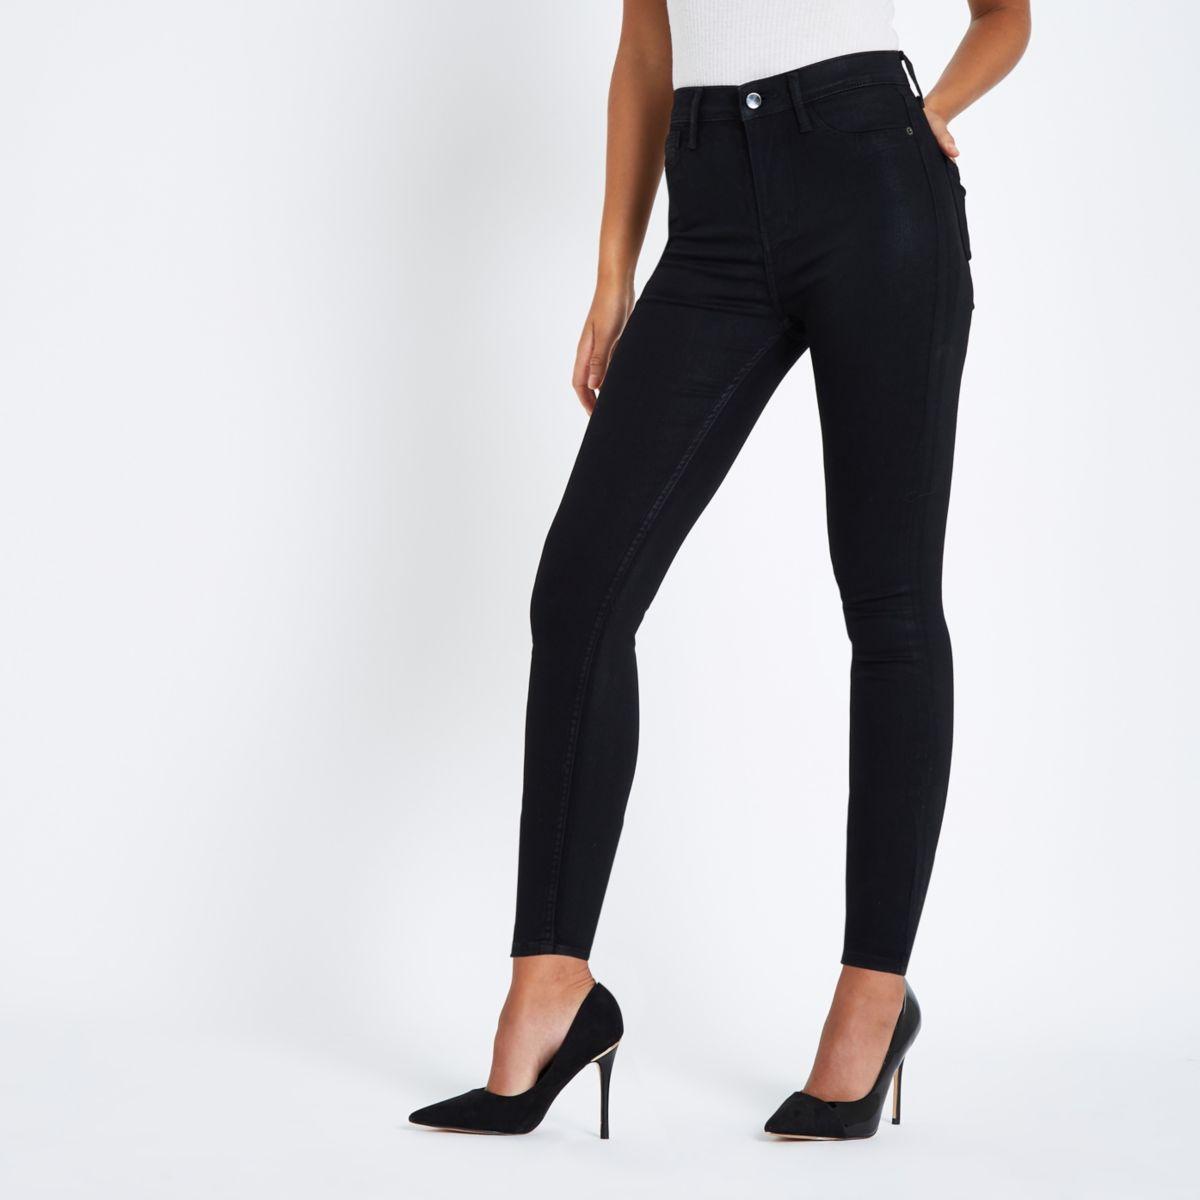 Harper - Zwarte enkellange skinny jeans